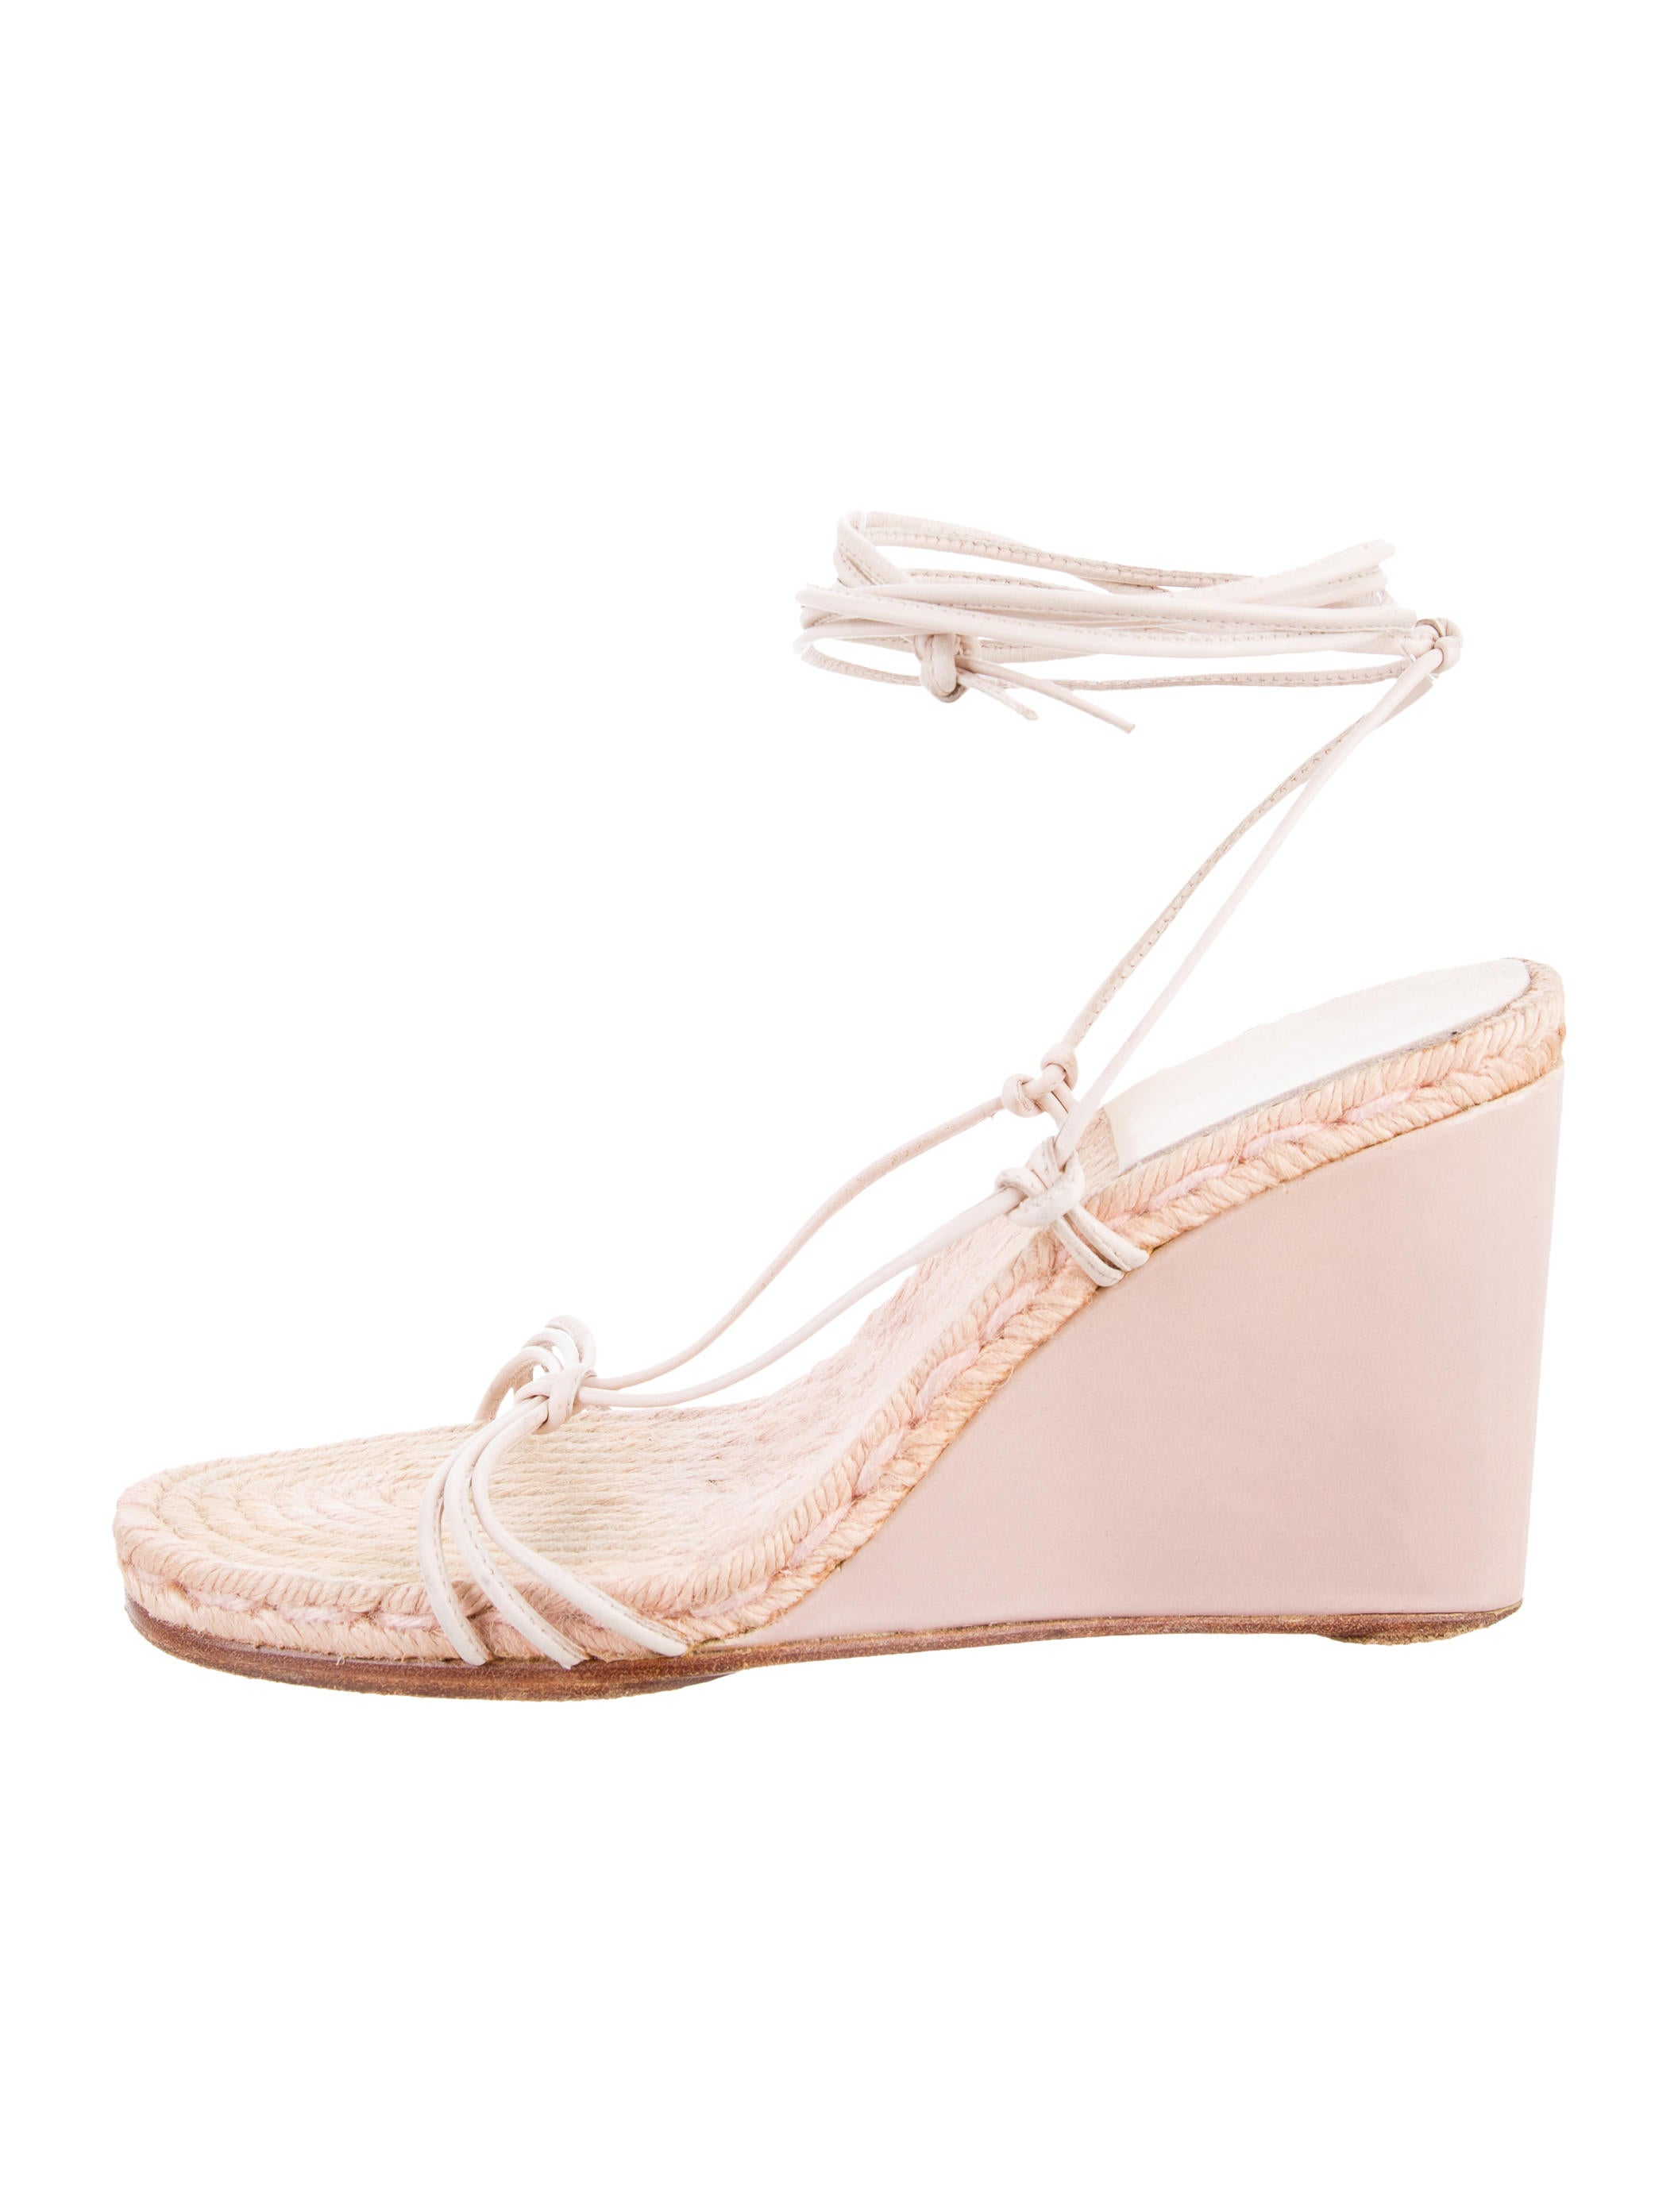 hermes women shoes - photo #24